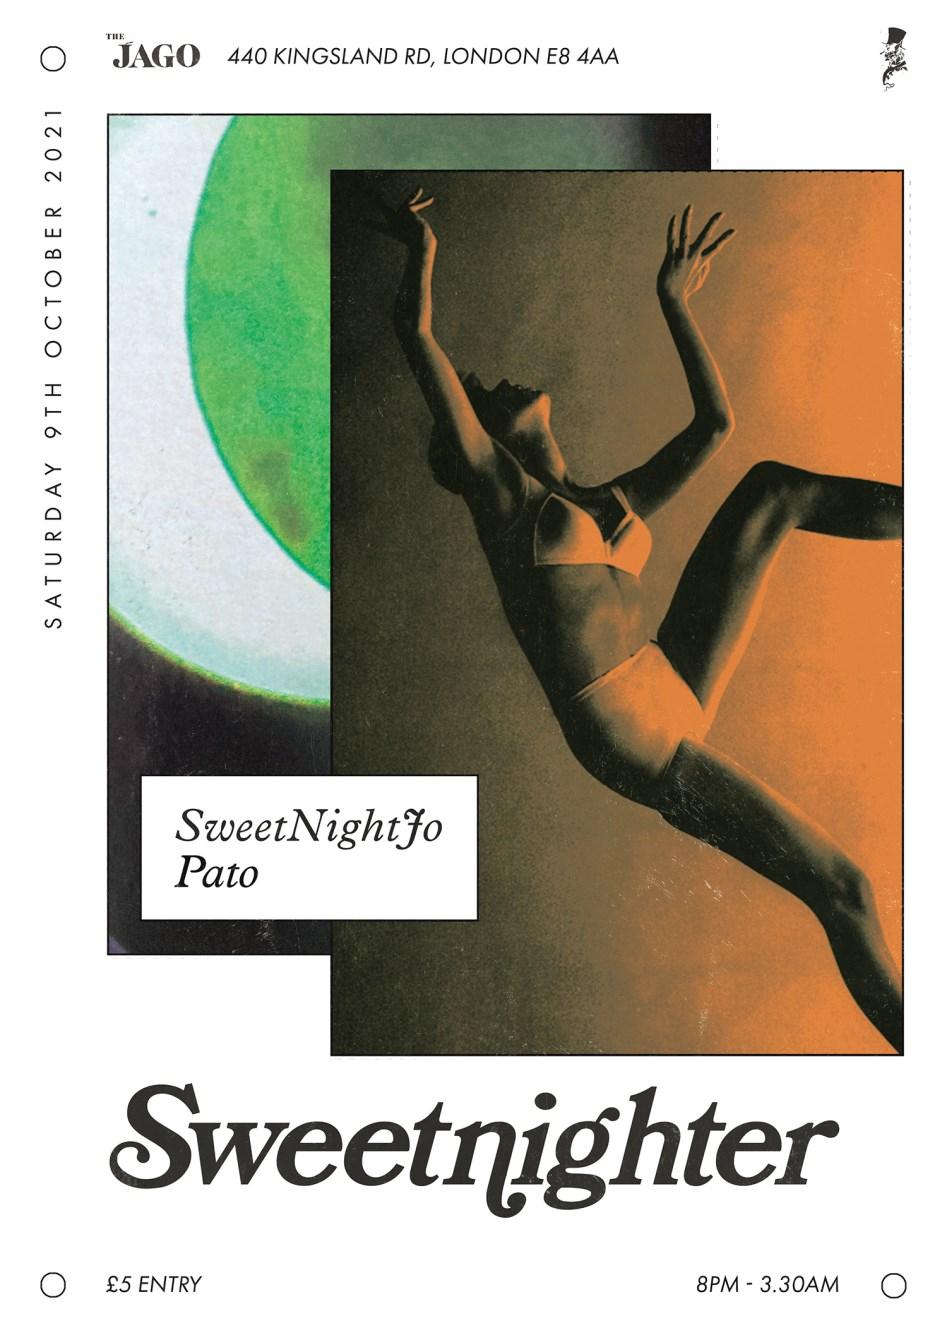 Sweetnighter with Pato & Sweetnightjo - Flyer back